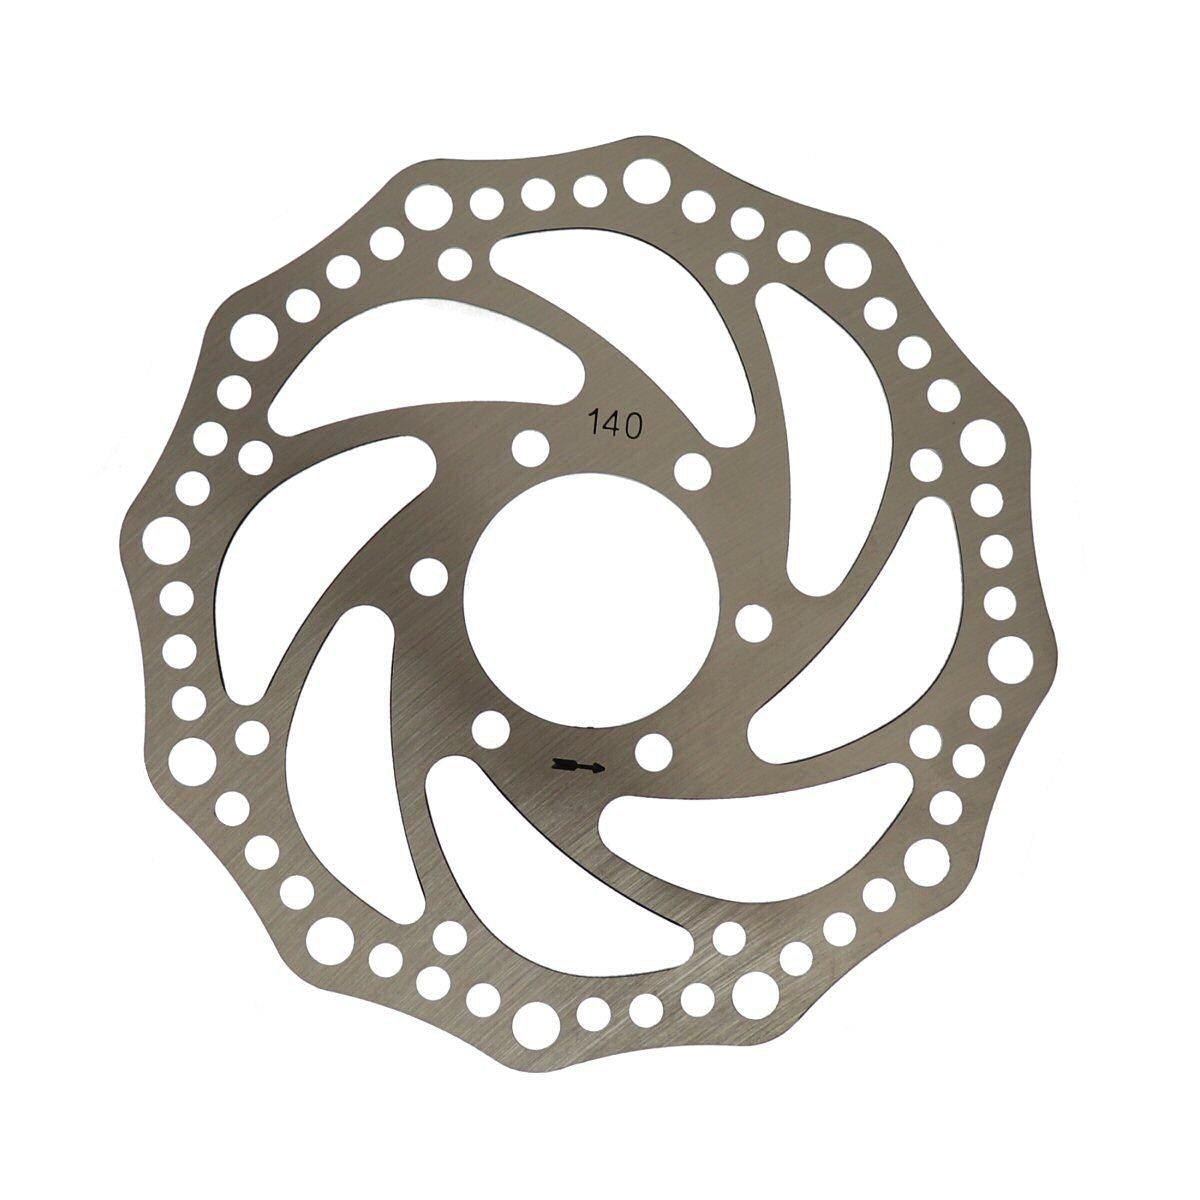 Pocket Bike Disc Brake Rotor